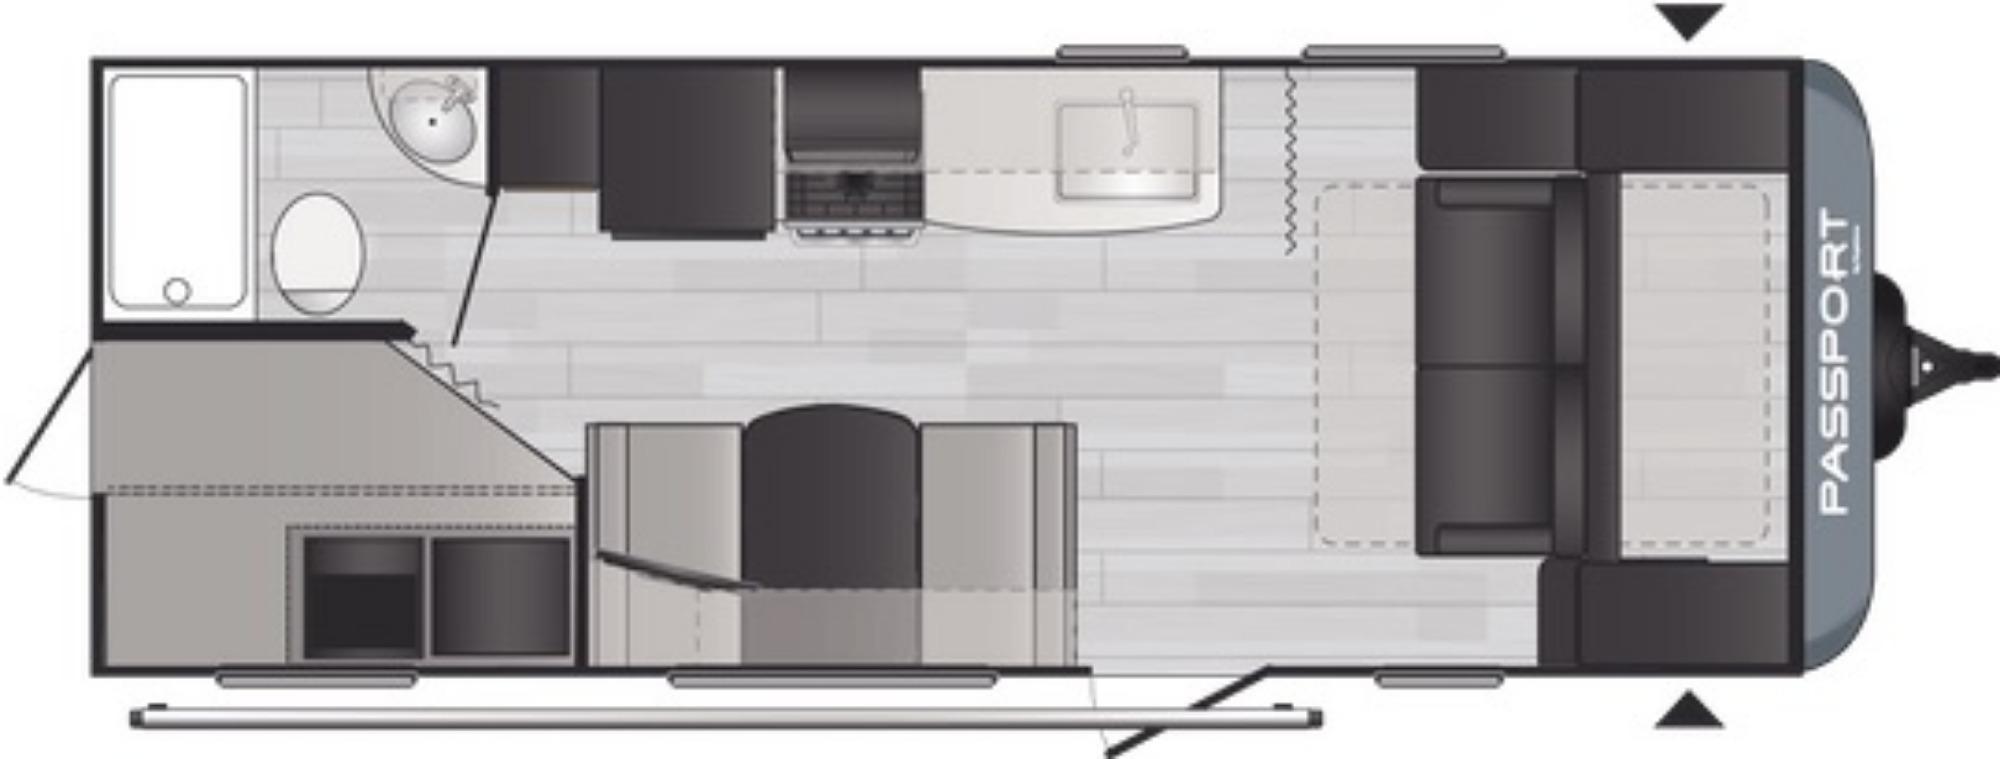 View Floor Plan for 2021 KEYSTONE PASSPORT 219BHWE